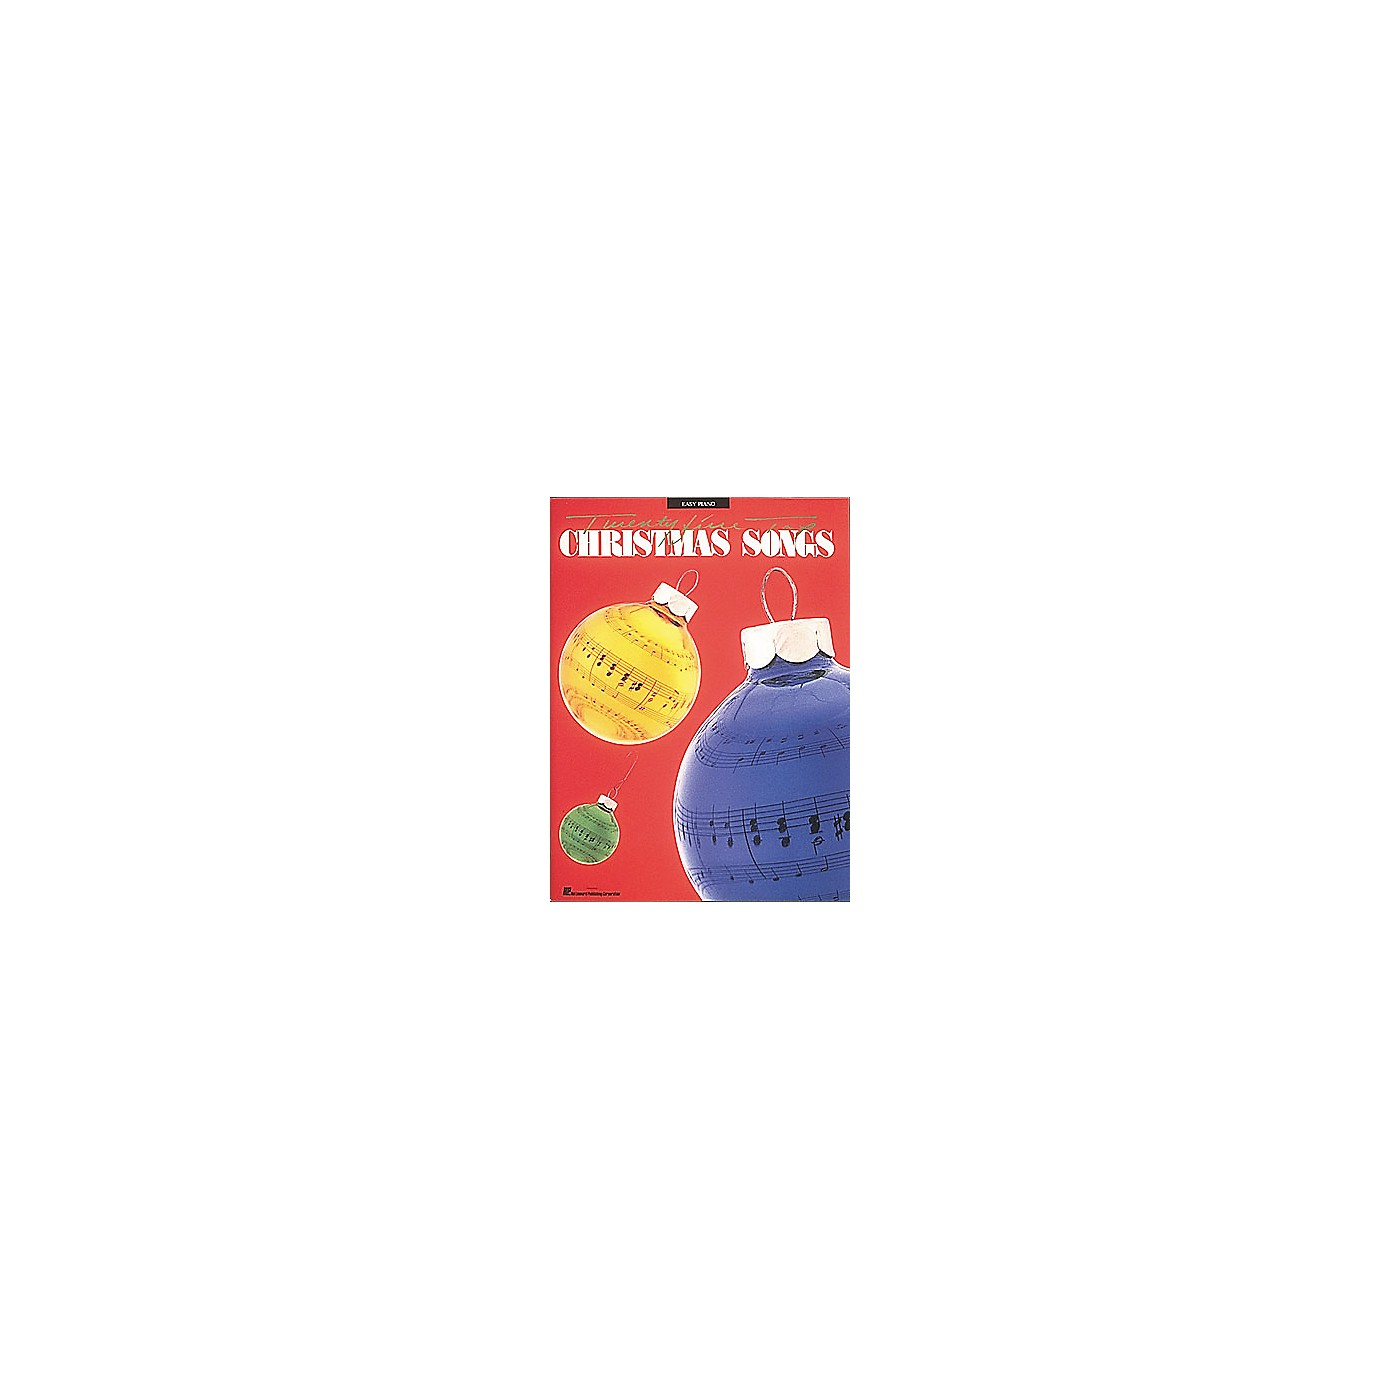 Hal Leonard Twenty Five Top Christmas Songs For Easy Piano thumbnail